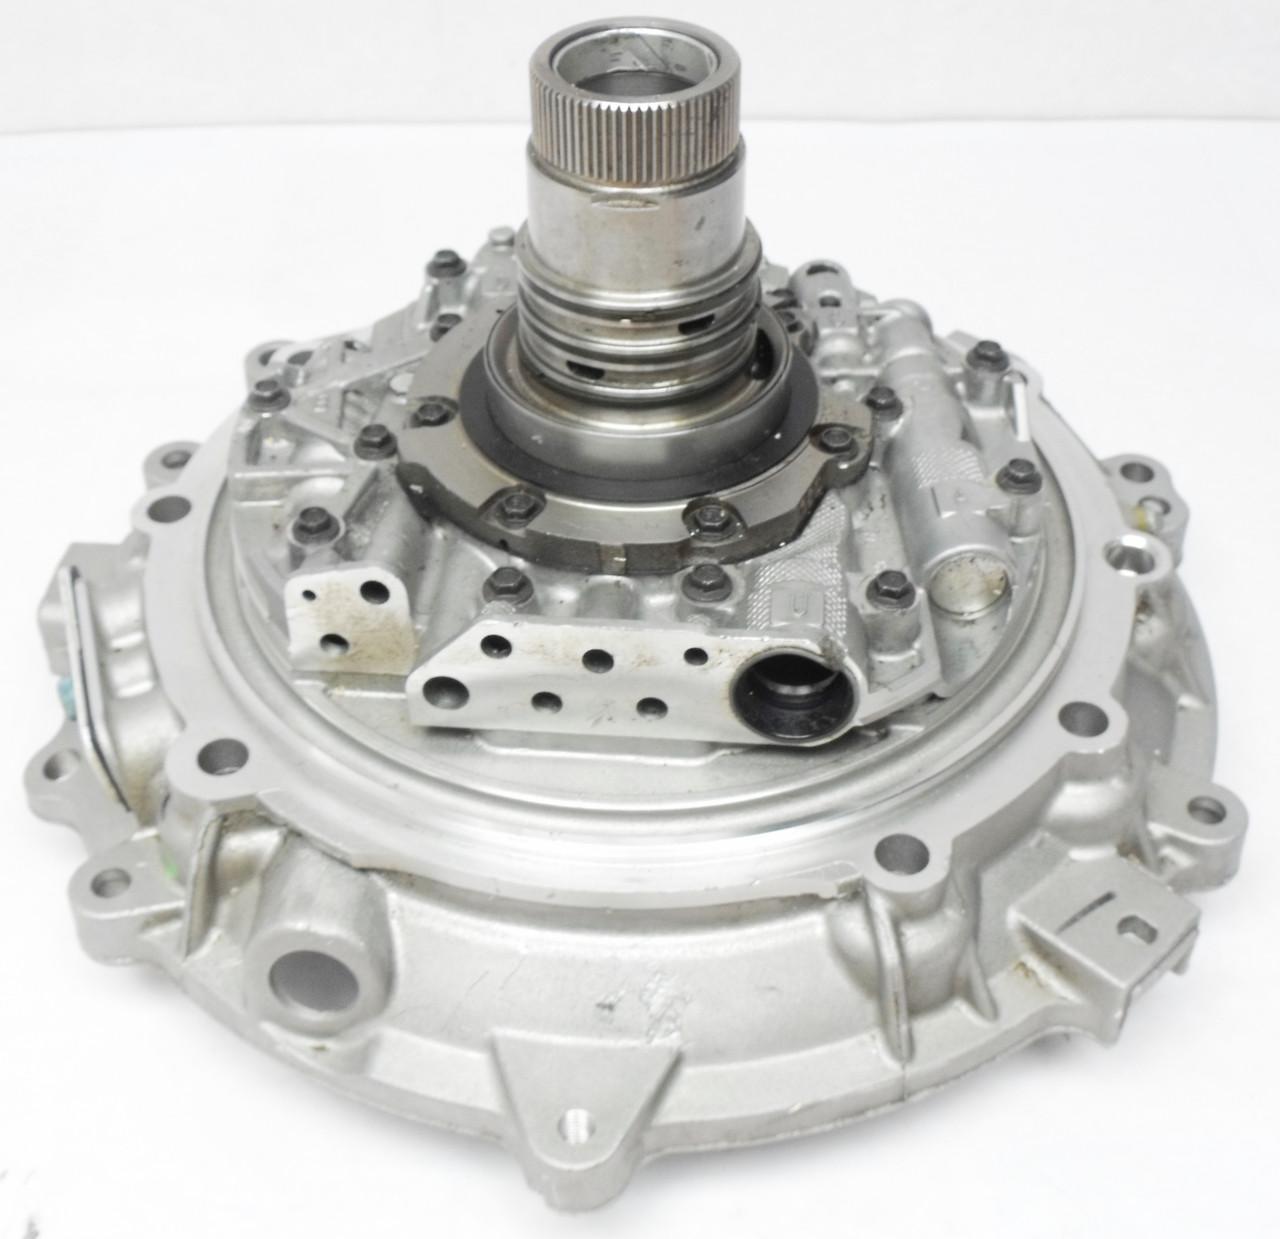 Gm Transmission Parts >> Gm 6l90e Transmission Pump Bell Housing Assembly 24236119